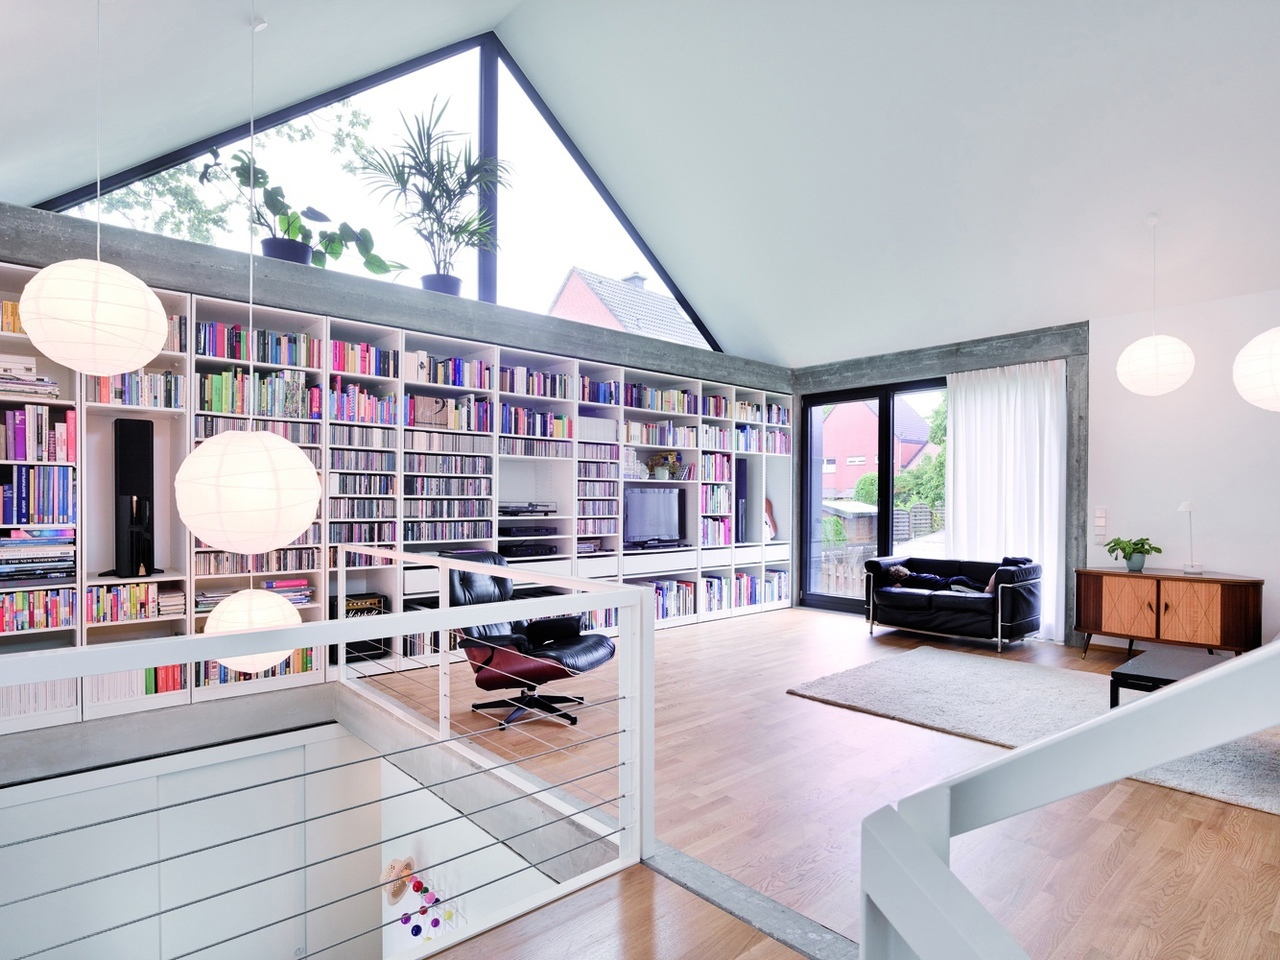 House in Havixbeck / Kai Binnewies